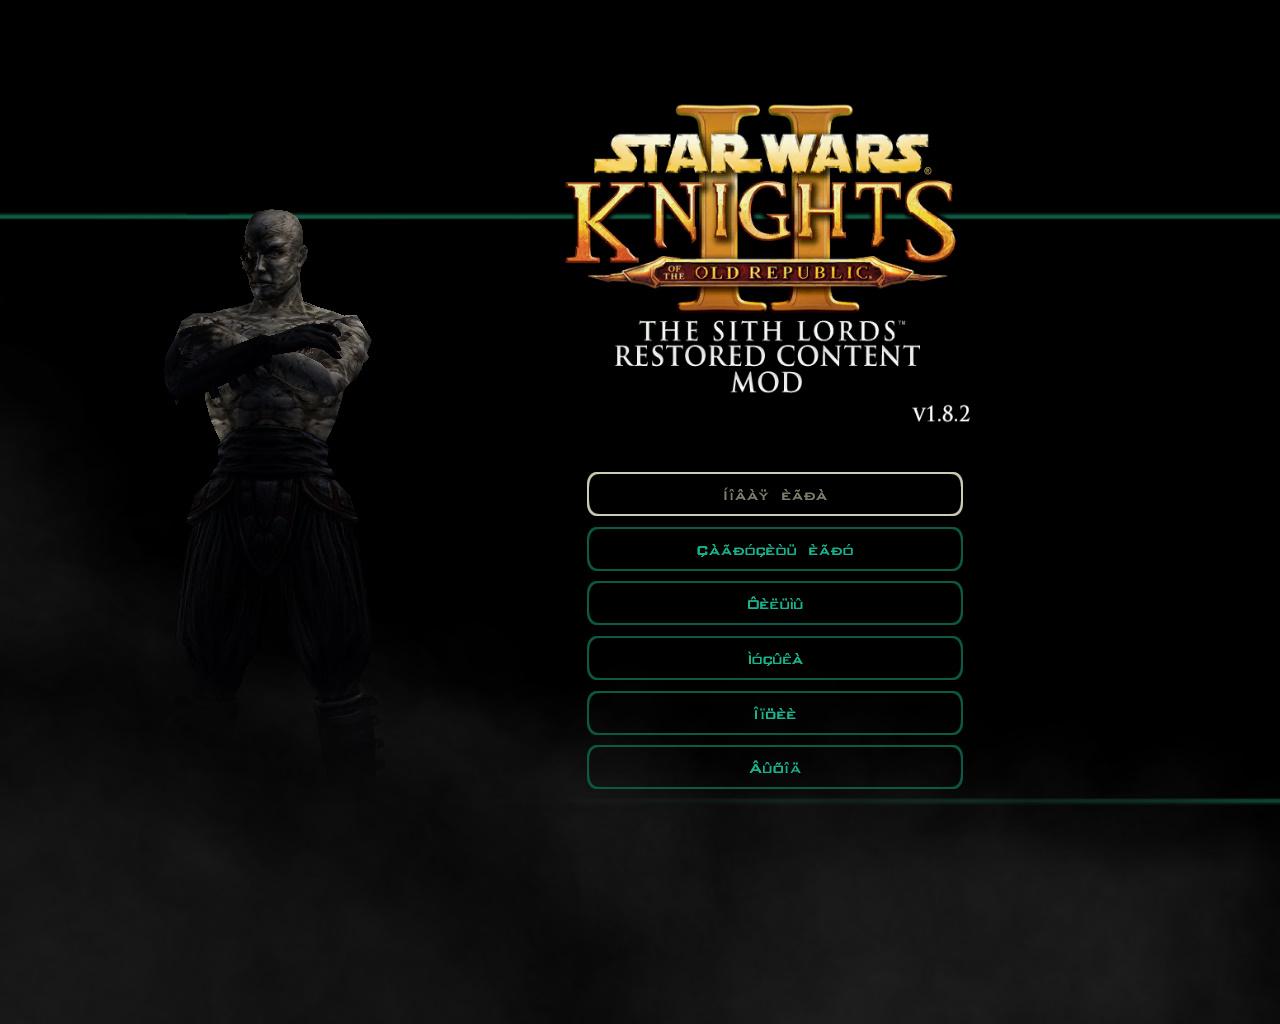 Star Wars Knights of the Old Republic 1 2 Проблемы Архив